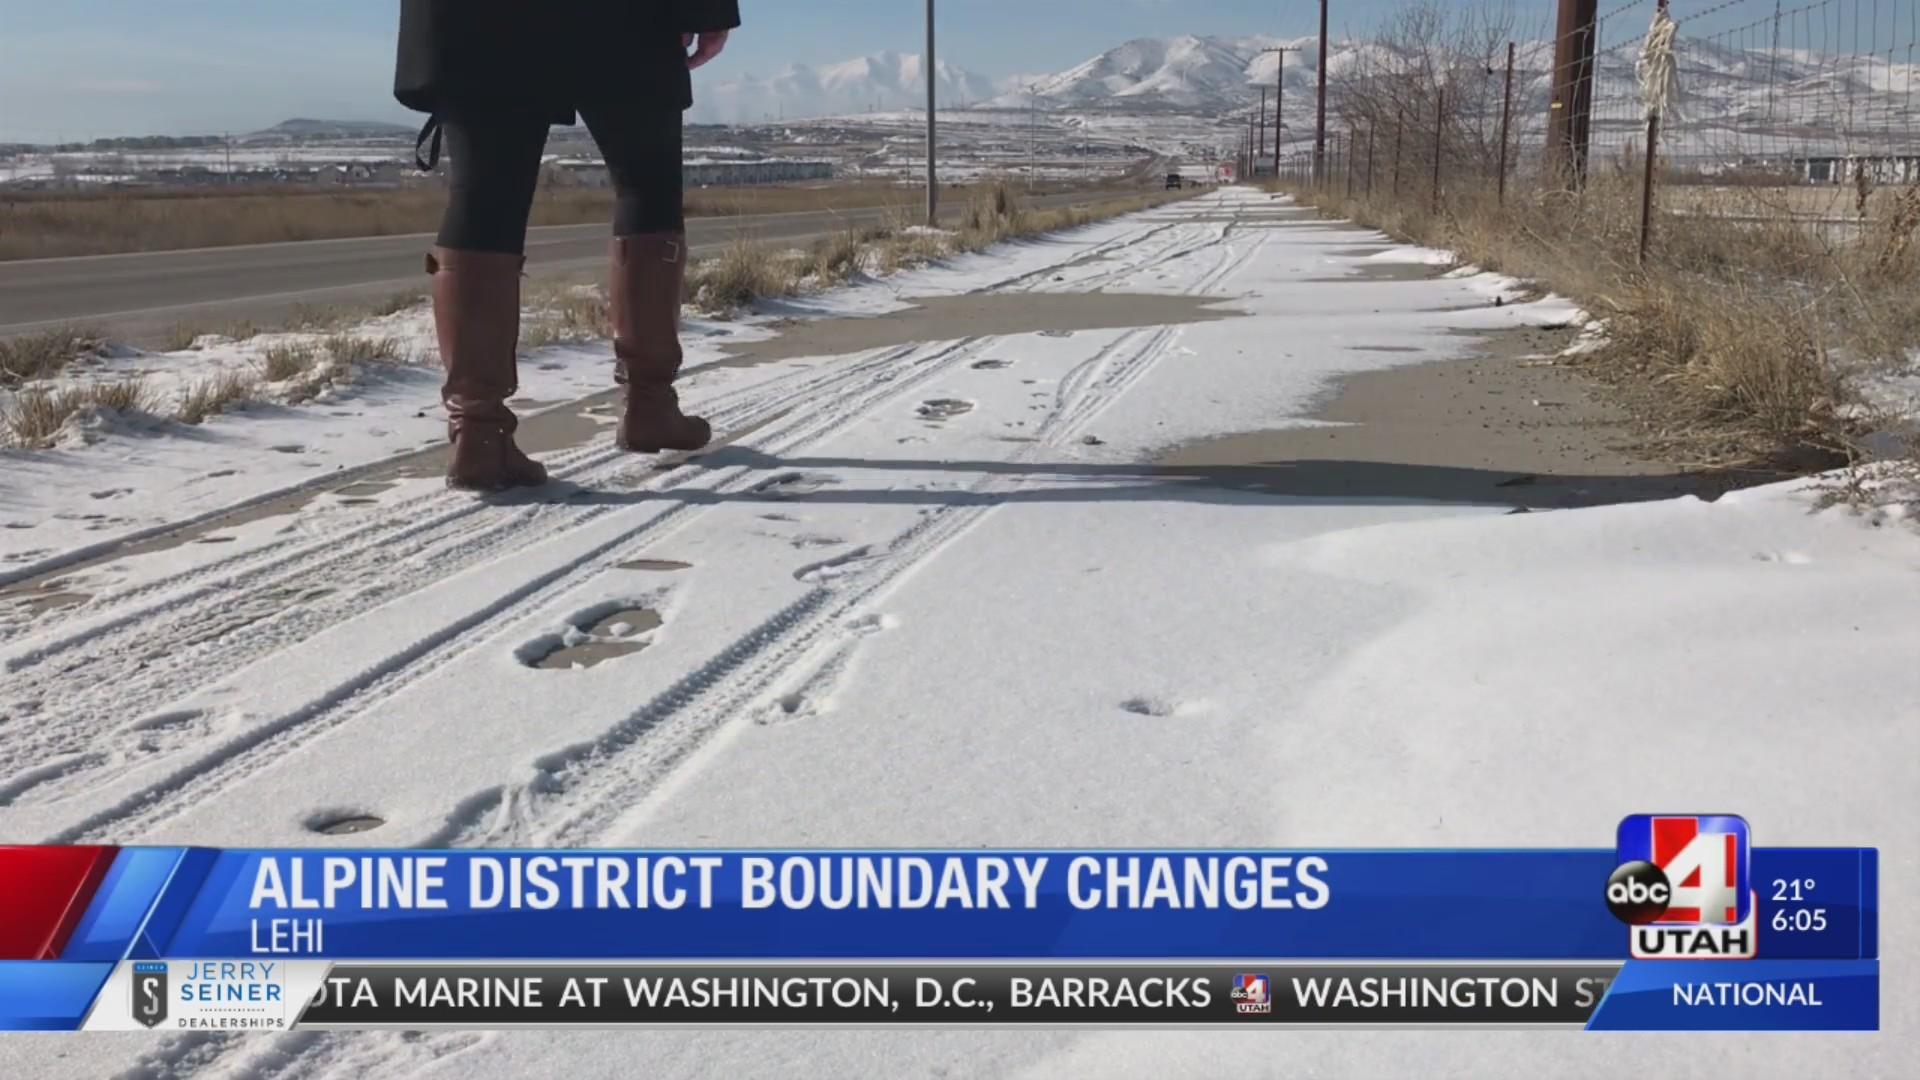 A dangerous walk to school: Lehi boundary changes